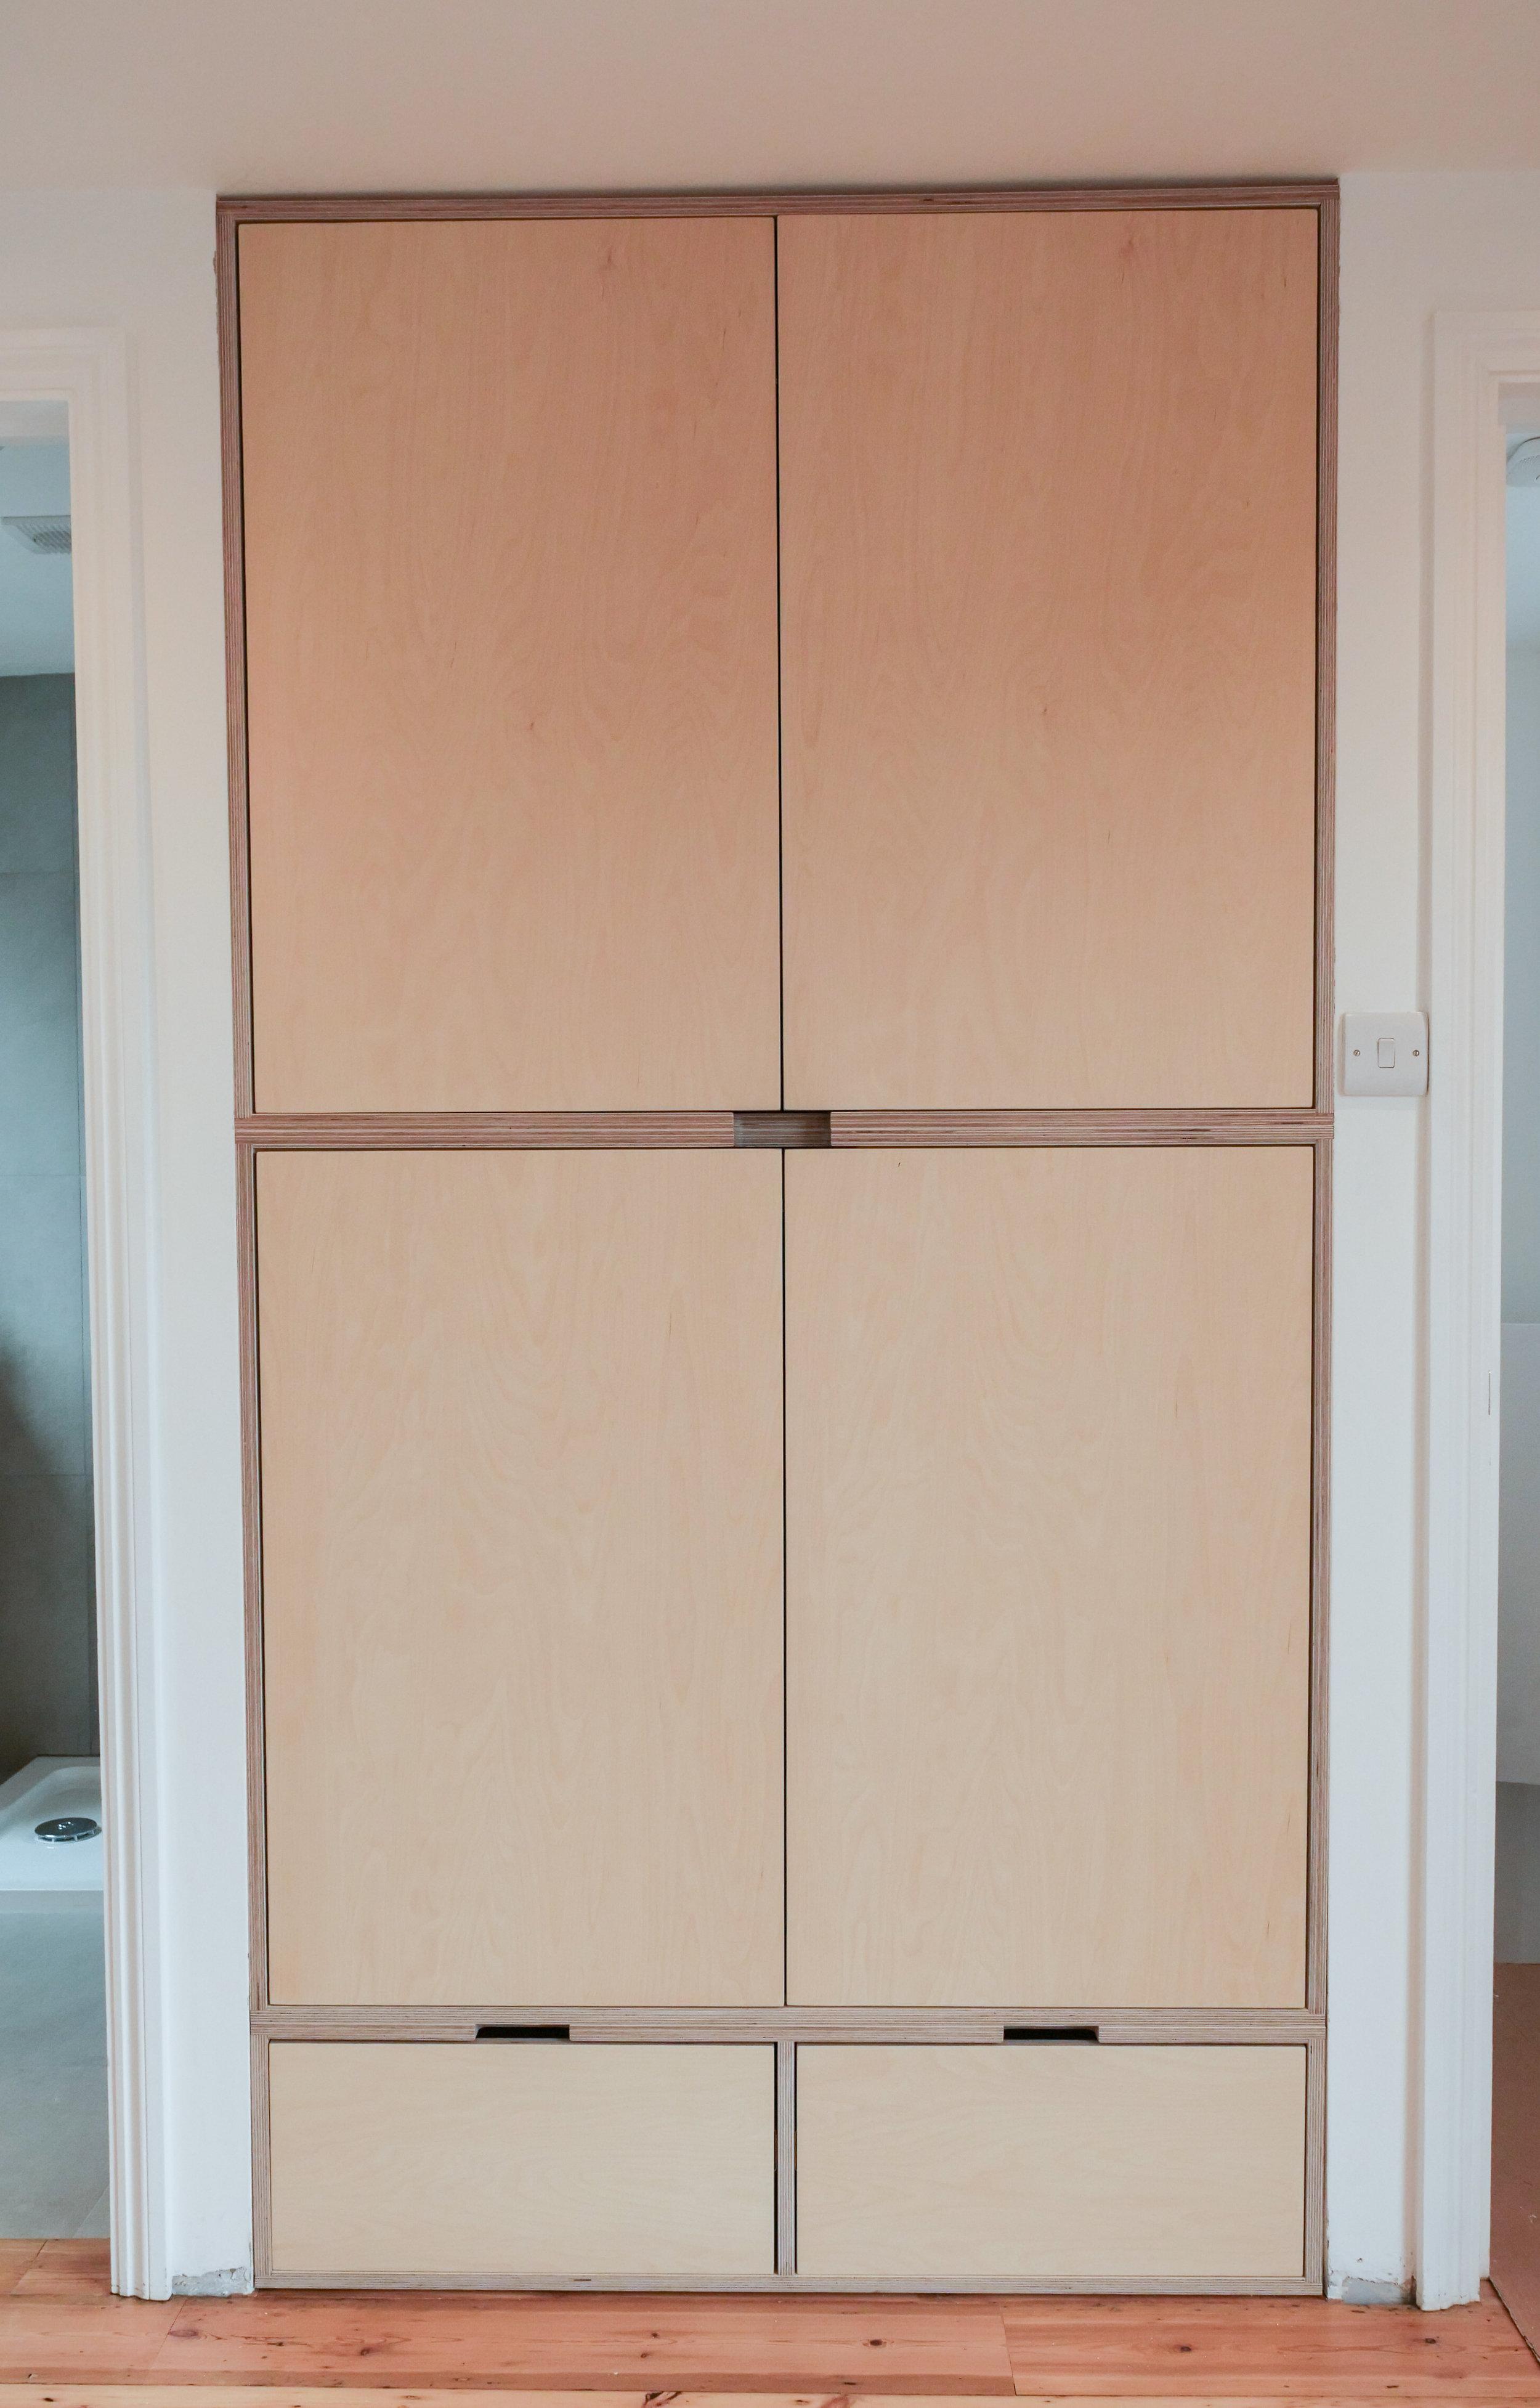 Birch ply bespoke wardrobe